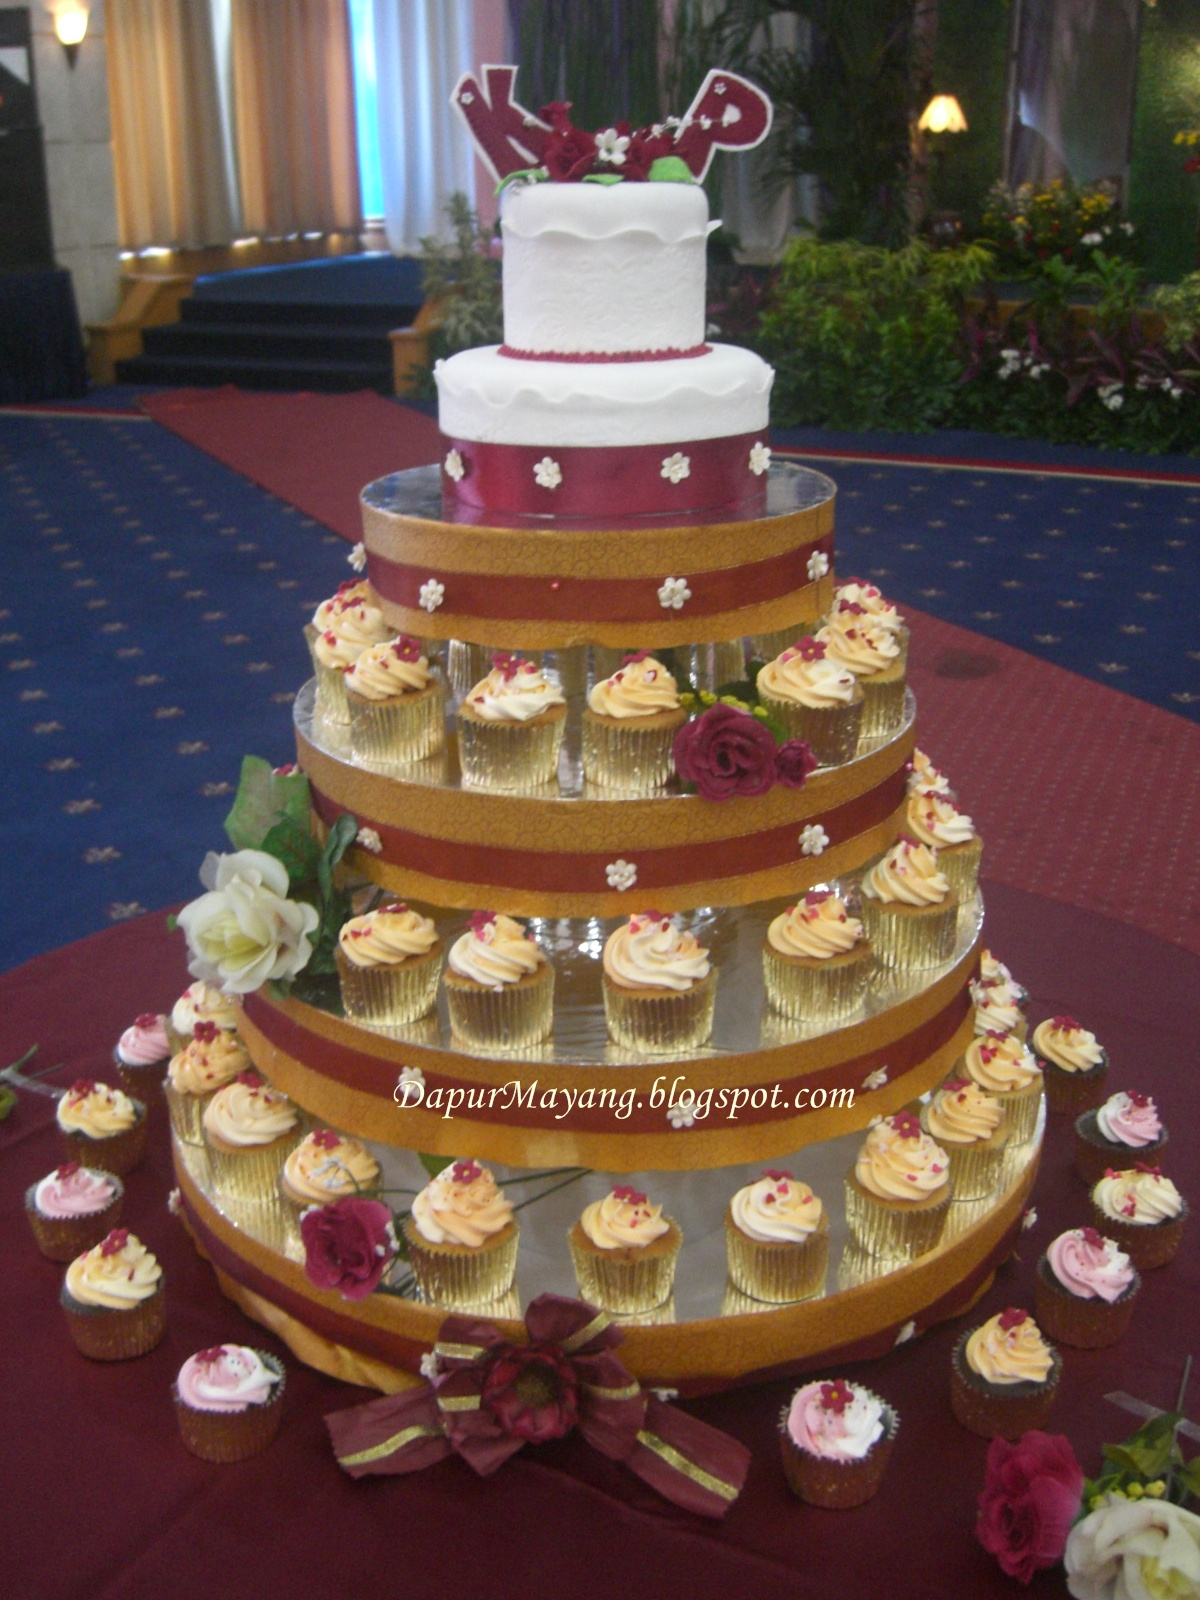 Order Kue Online Adiel Cakes By Dapur Mayang Daftar Harga Cake Di - Harga Dummy Wedding Cake